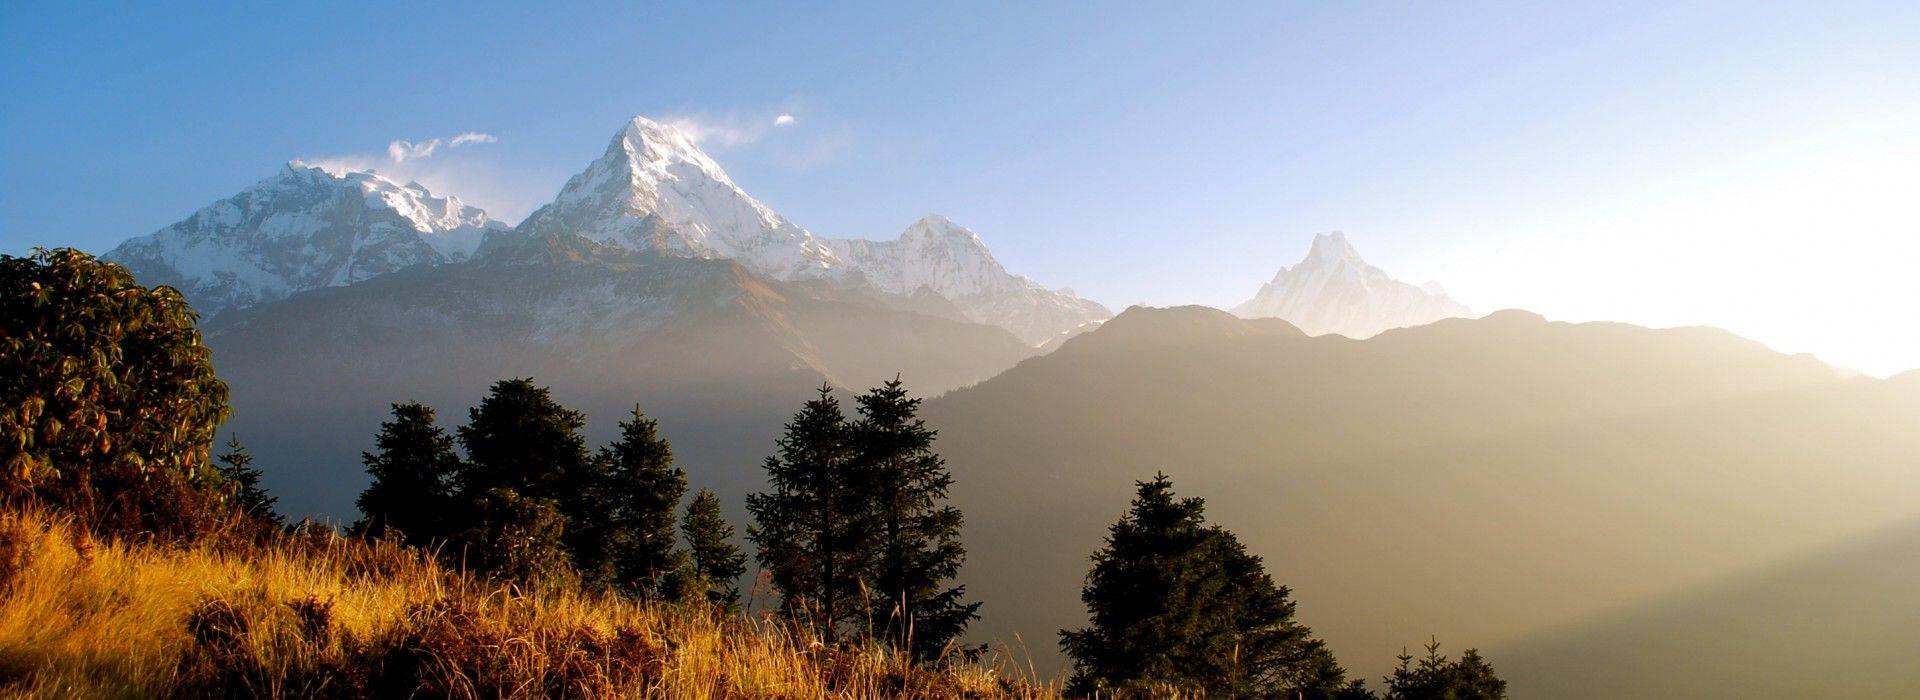 Natural landmarks sightseeing Tours in Chitwan National Park